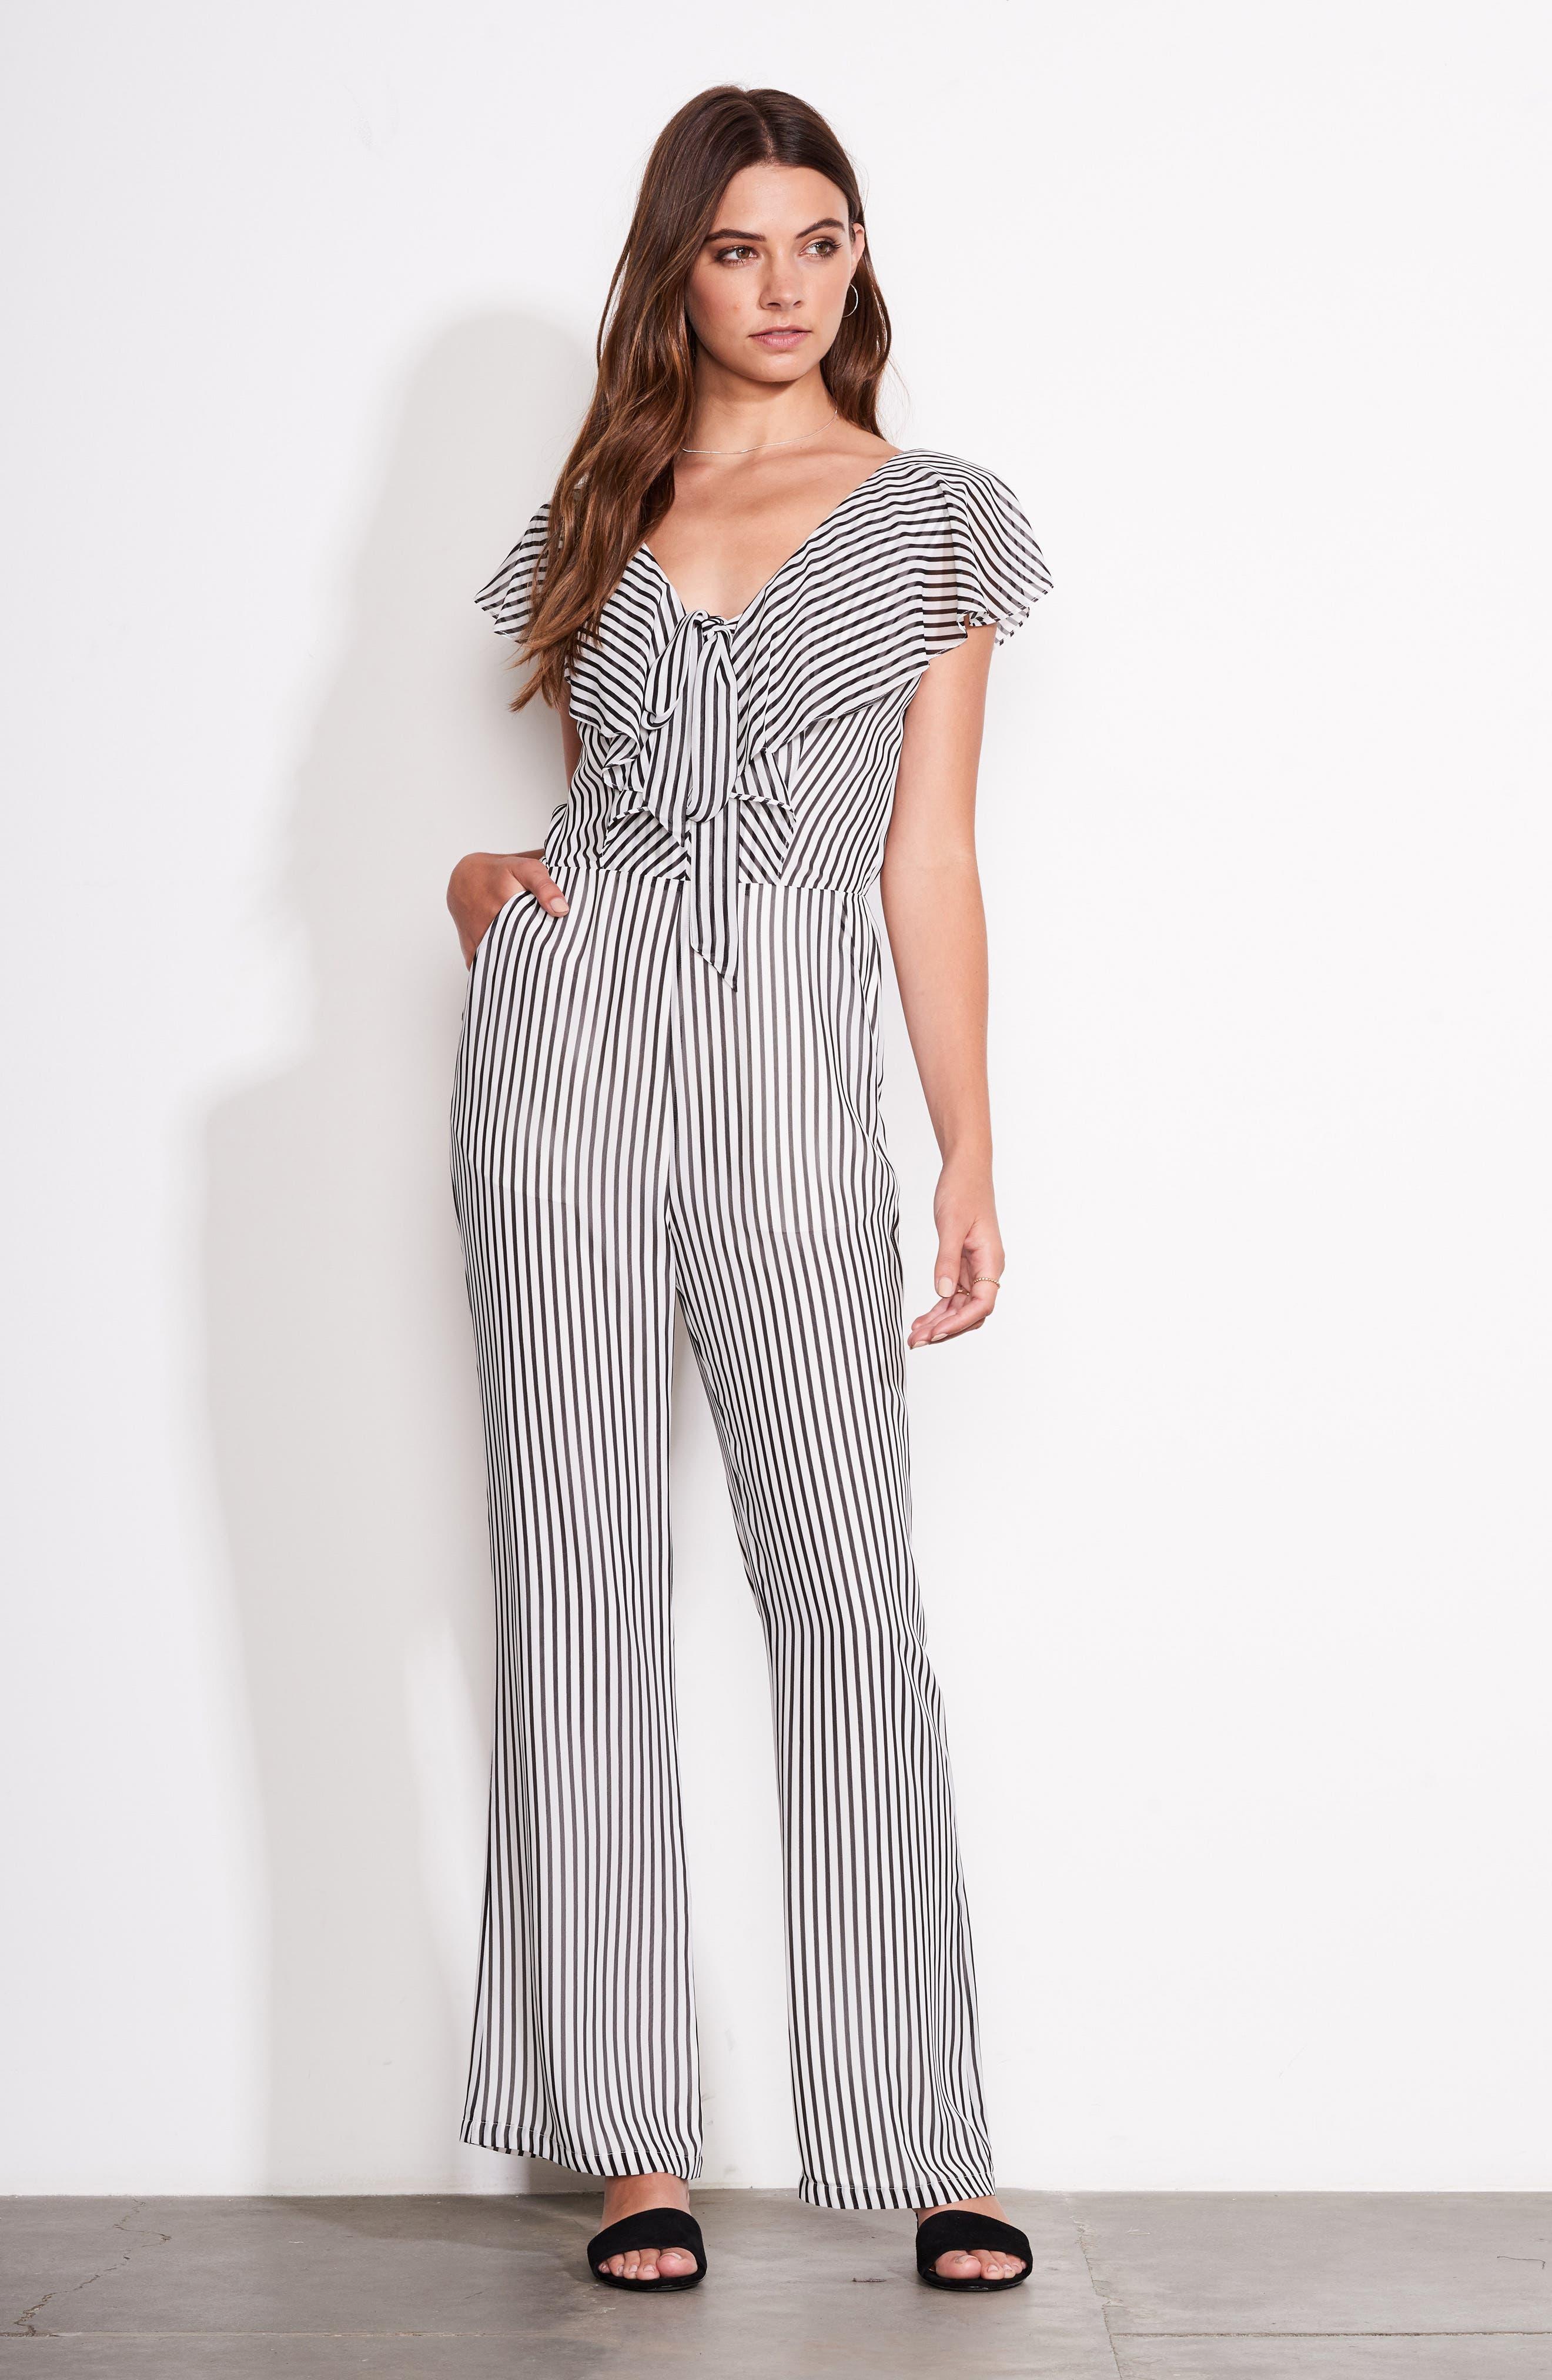 Cherry on Top Stripe Ruffle Jumpsuit,                             Alternate thumbnail 2, color,                             Black/ White Stripe